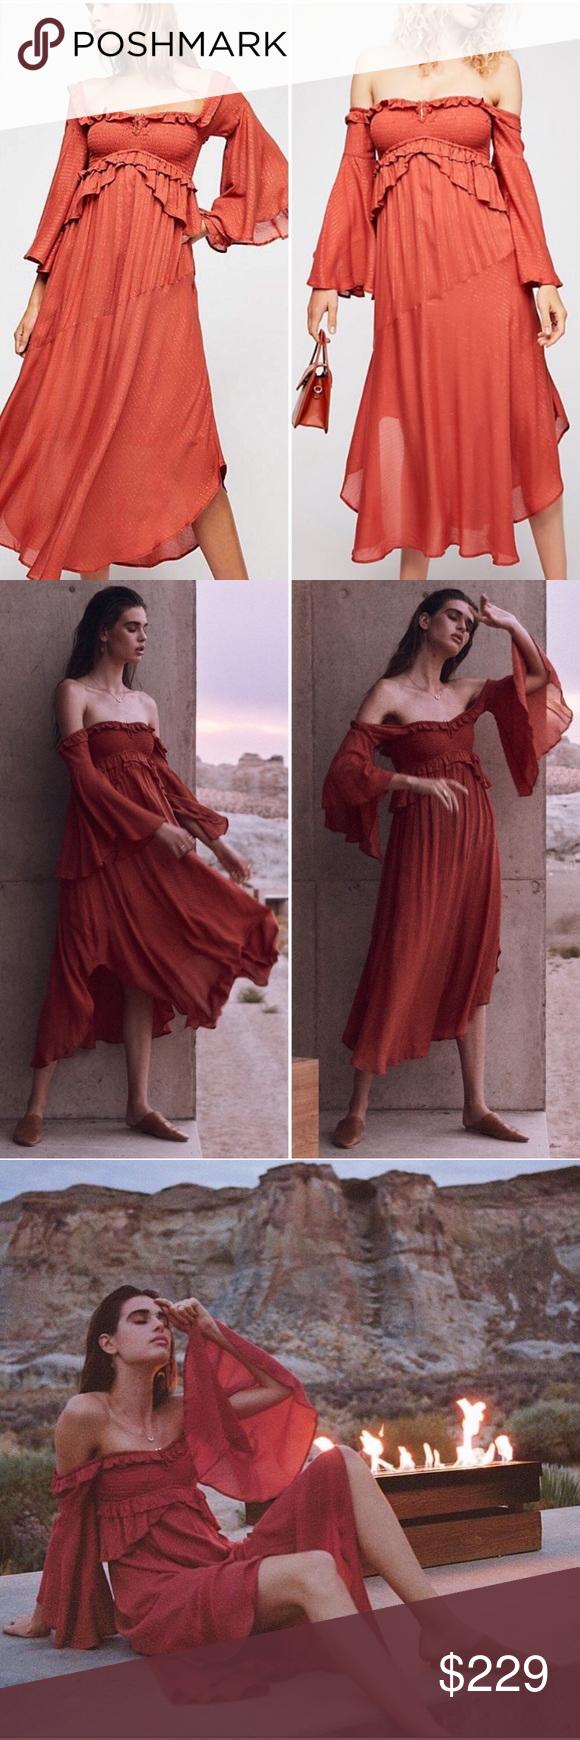 0dec5ab45b2f Spell & The Gypsy Florence Midi Dress Free People Florence Midi Dress  by Spell &